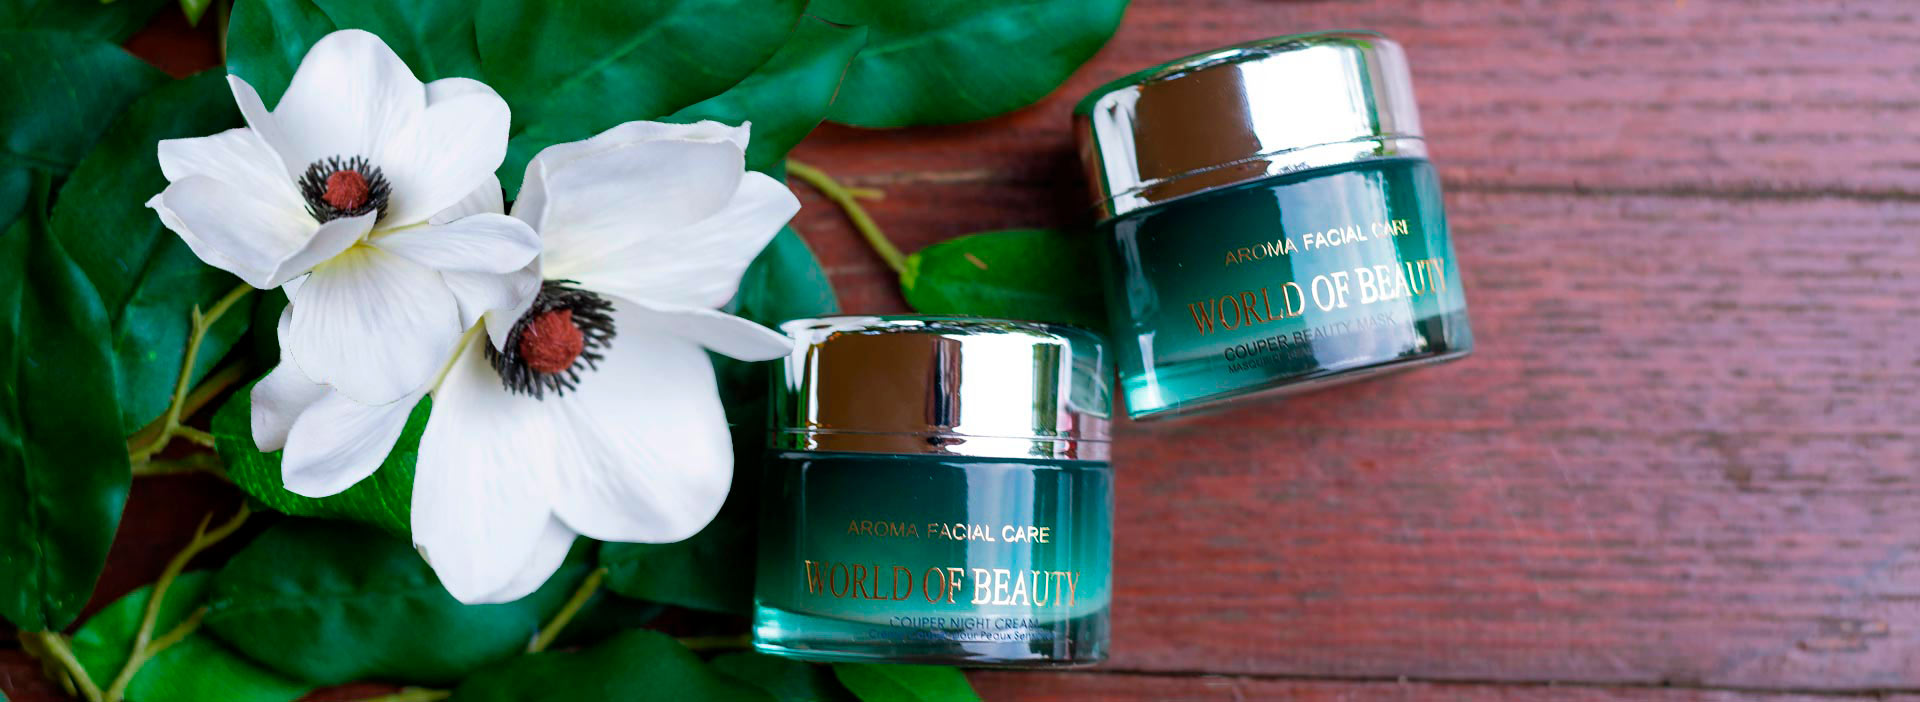 Organic cosmetic facial care